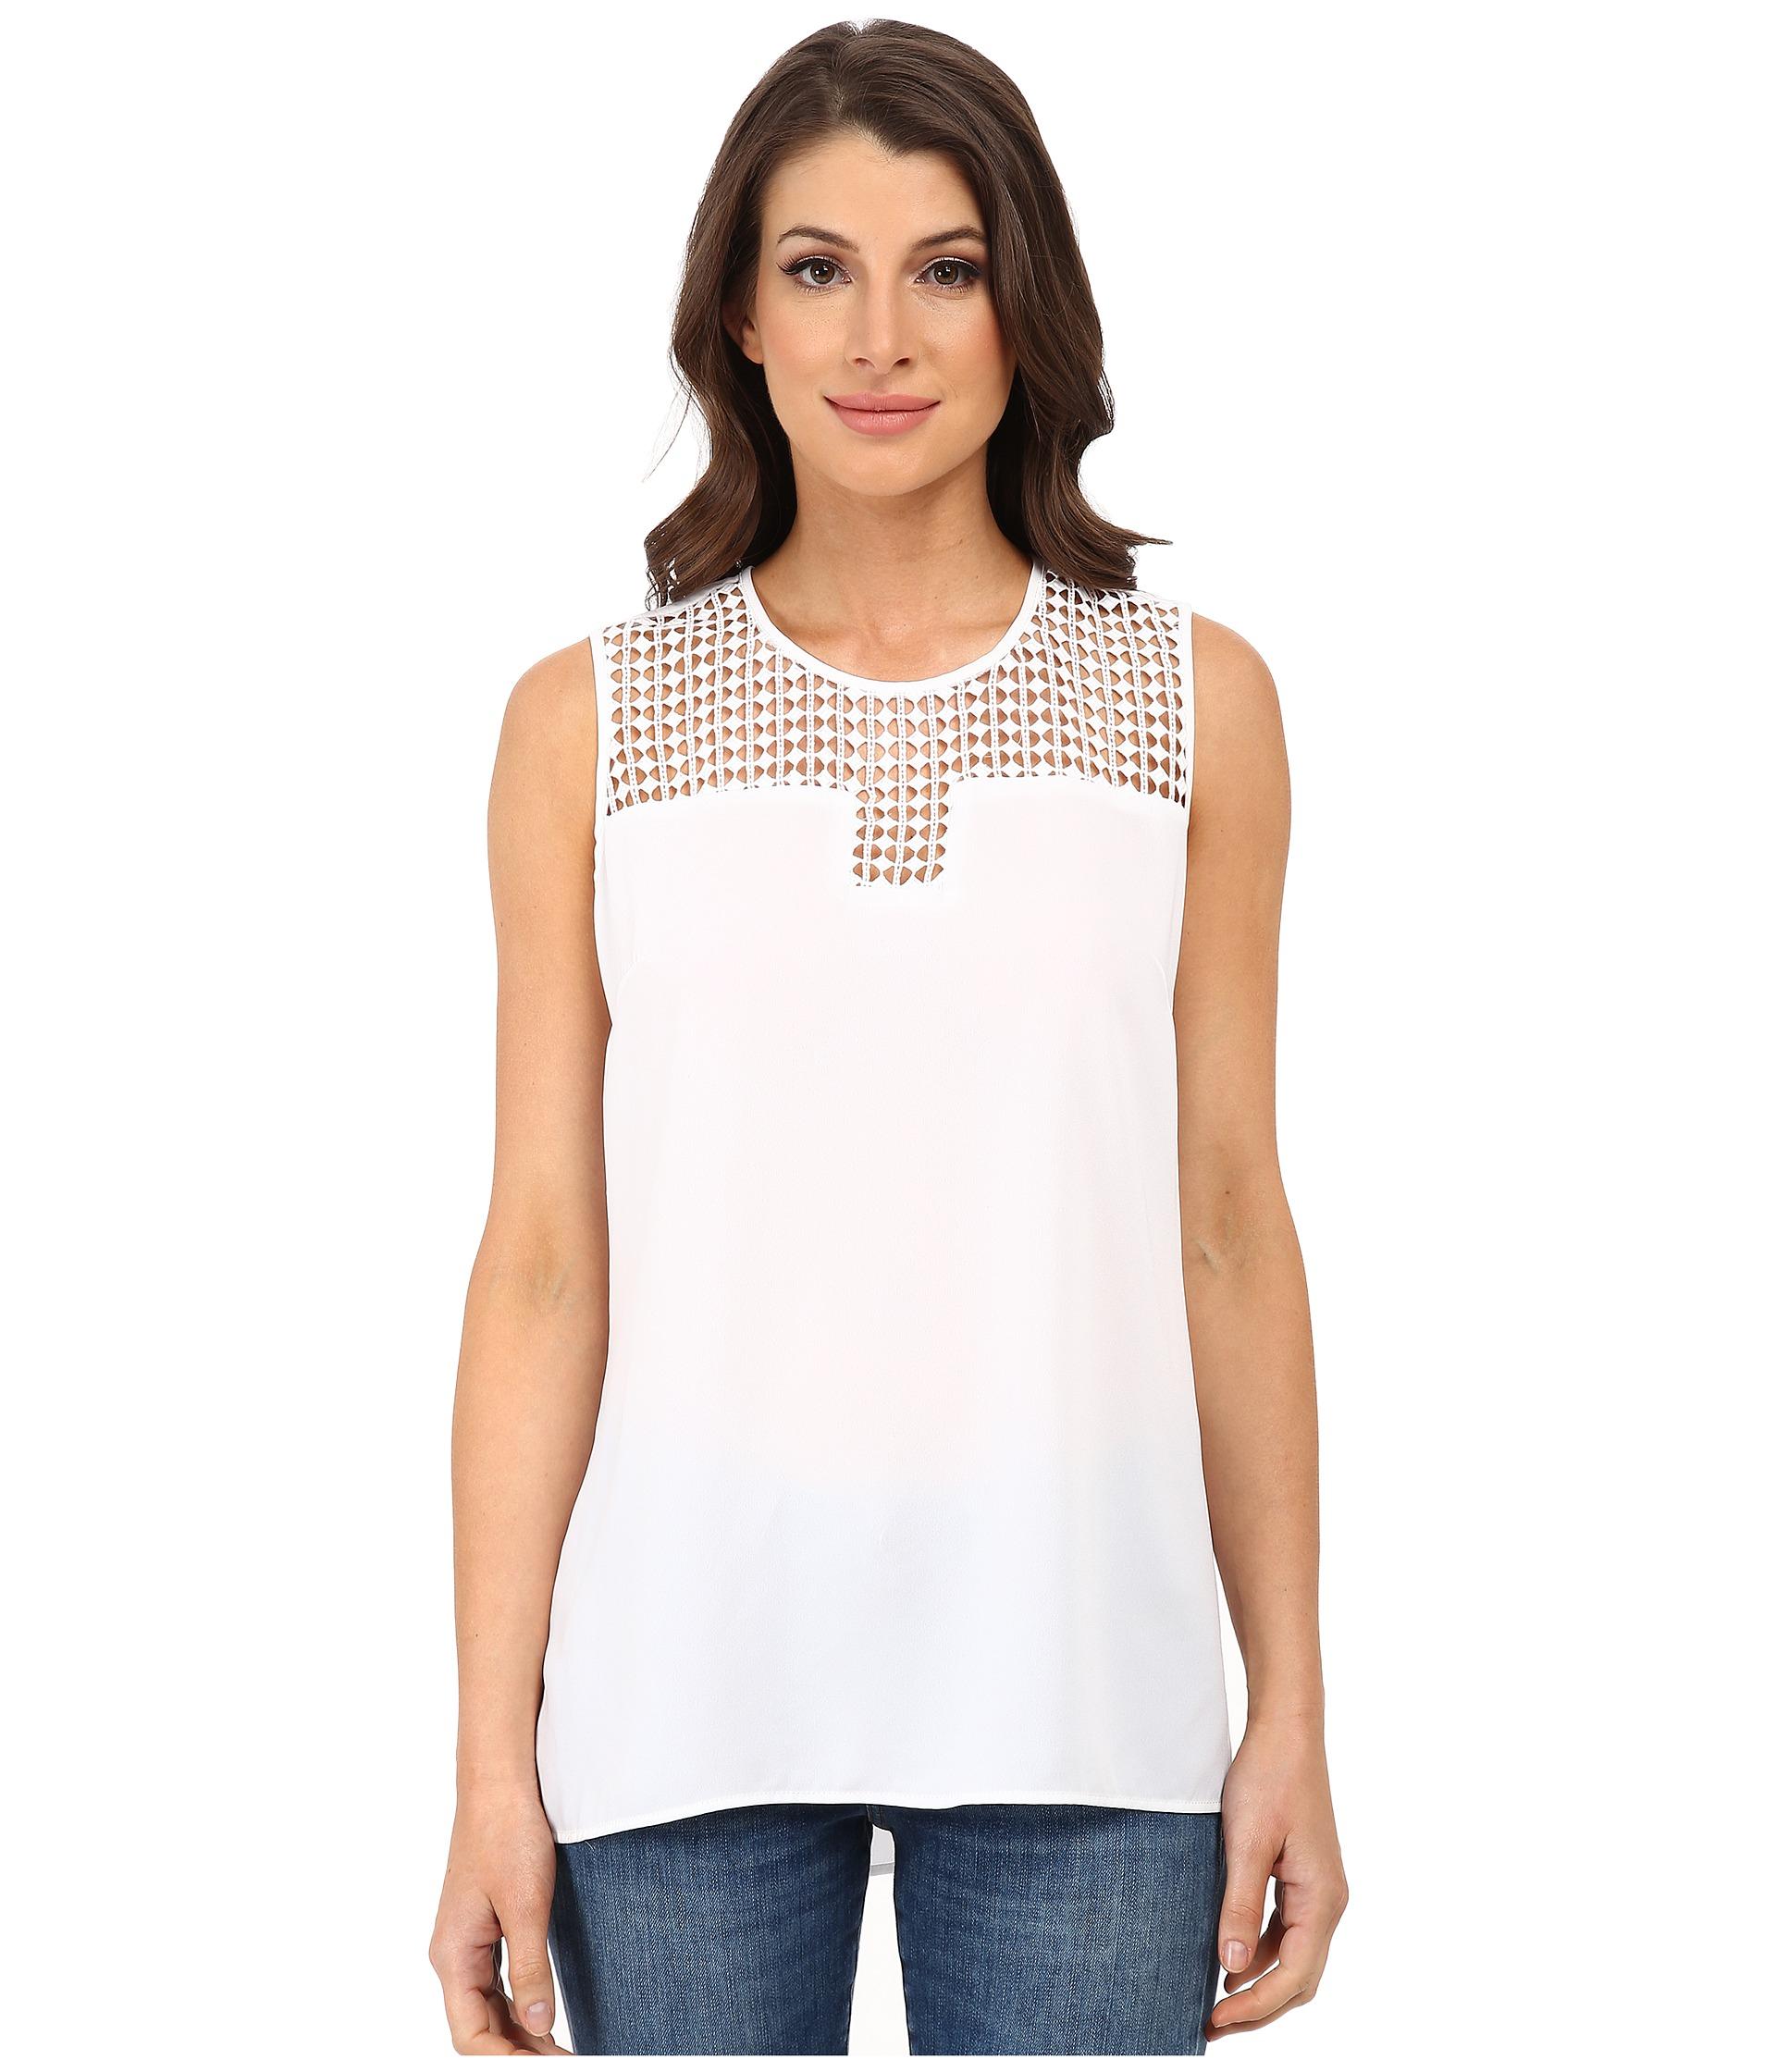 Women'S Sleeveless Cotton Blouses 49